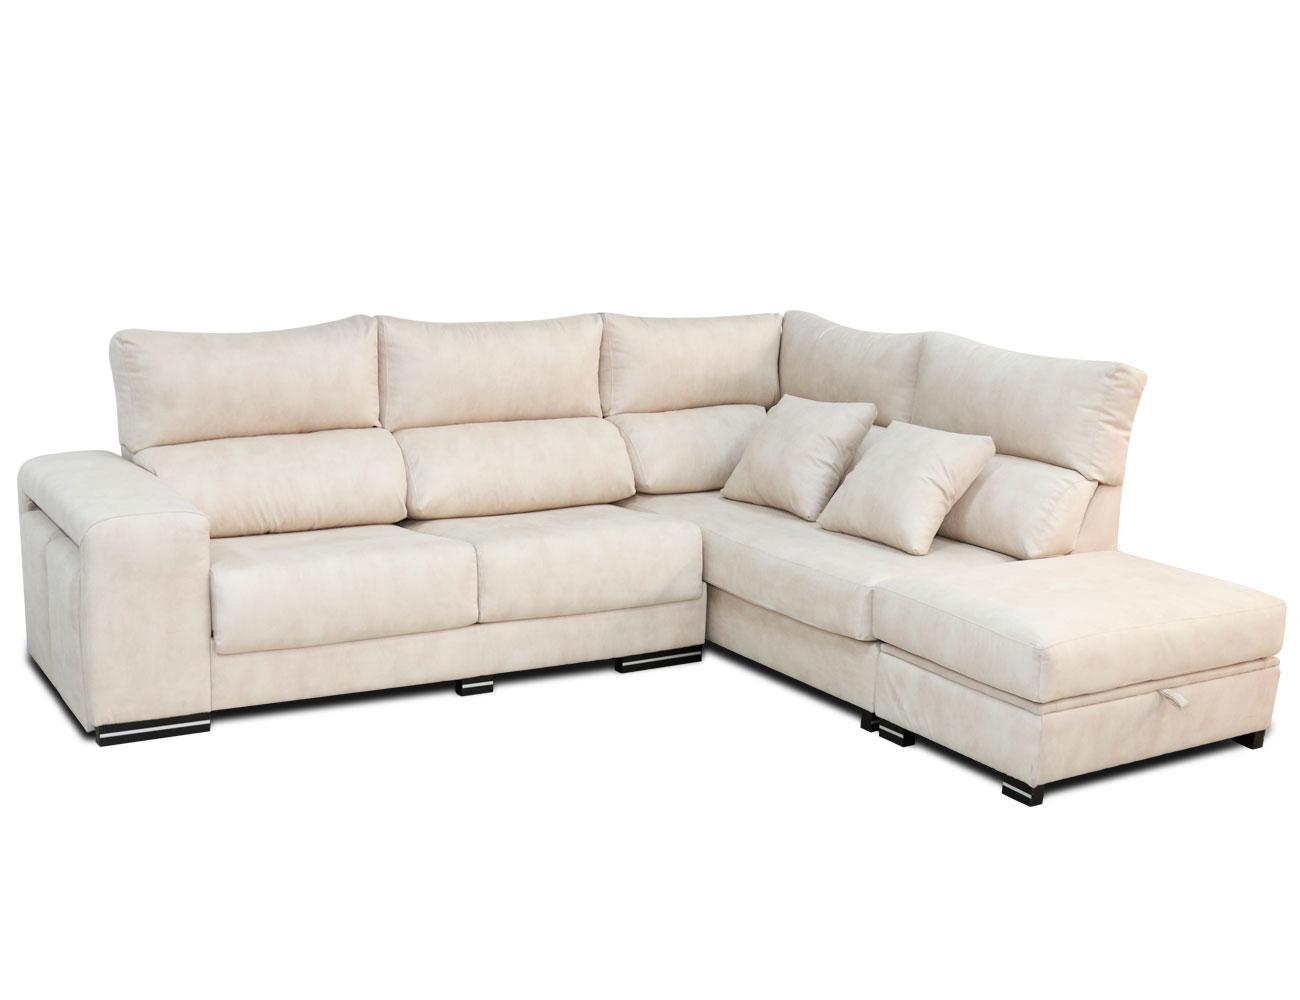 Sofa chaiselongue rincon arcon puf taburetes surf blanco